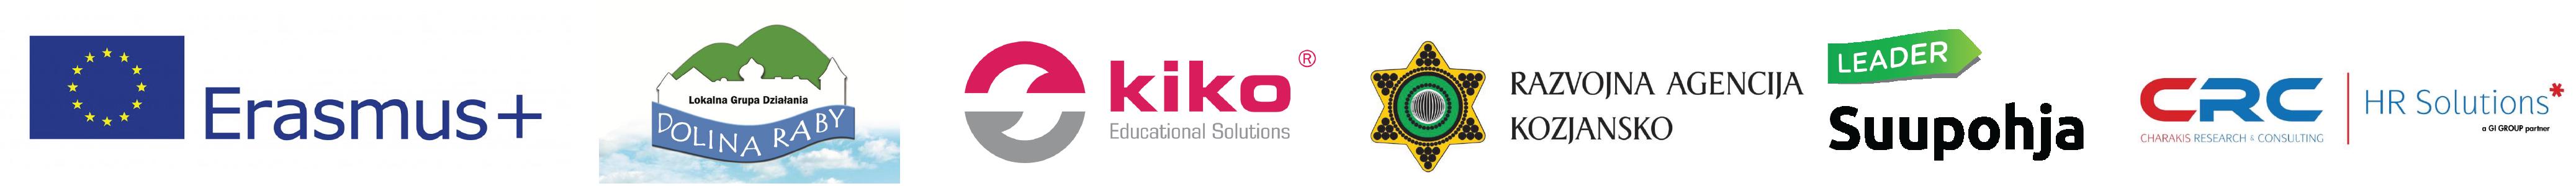 Cuheko Logos 150 png